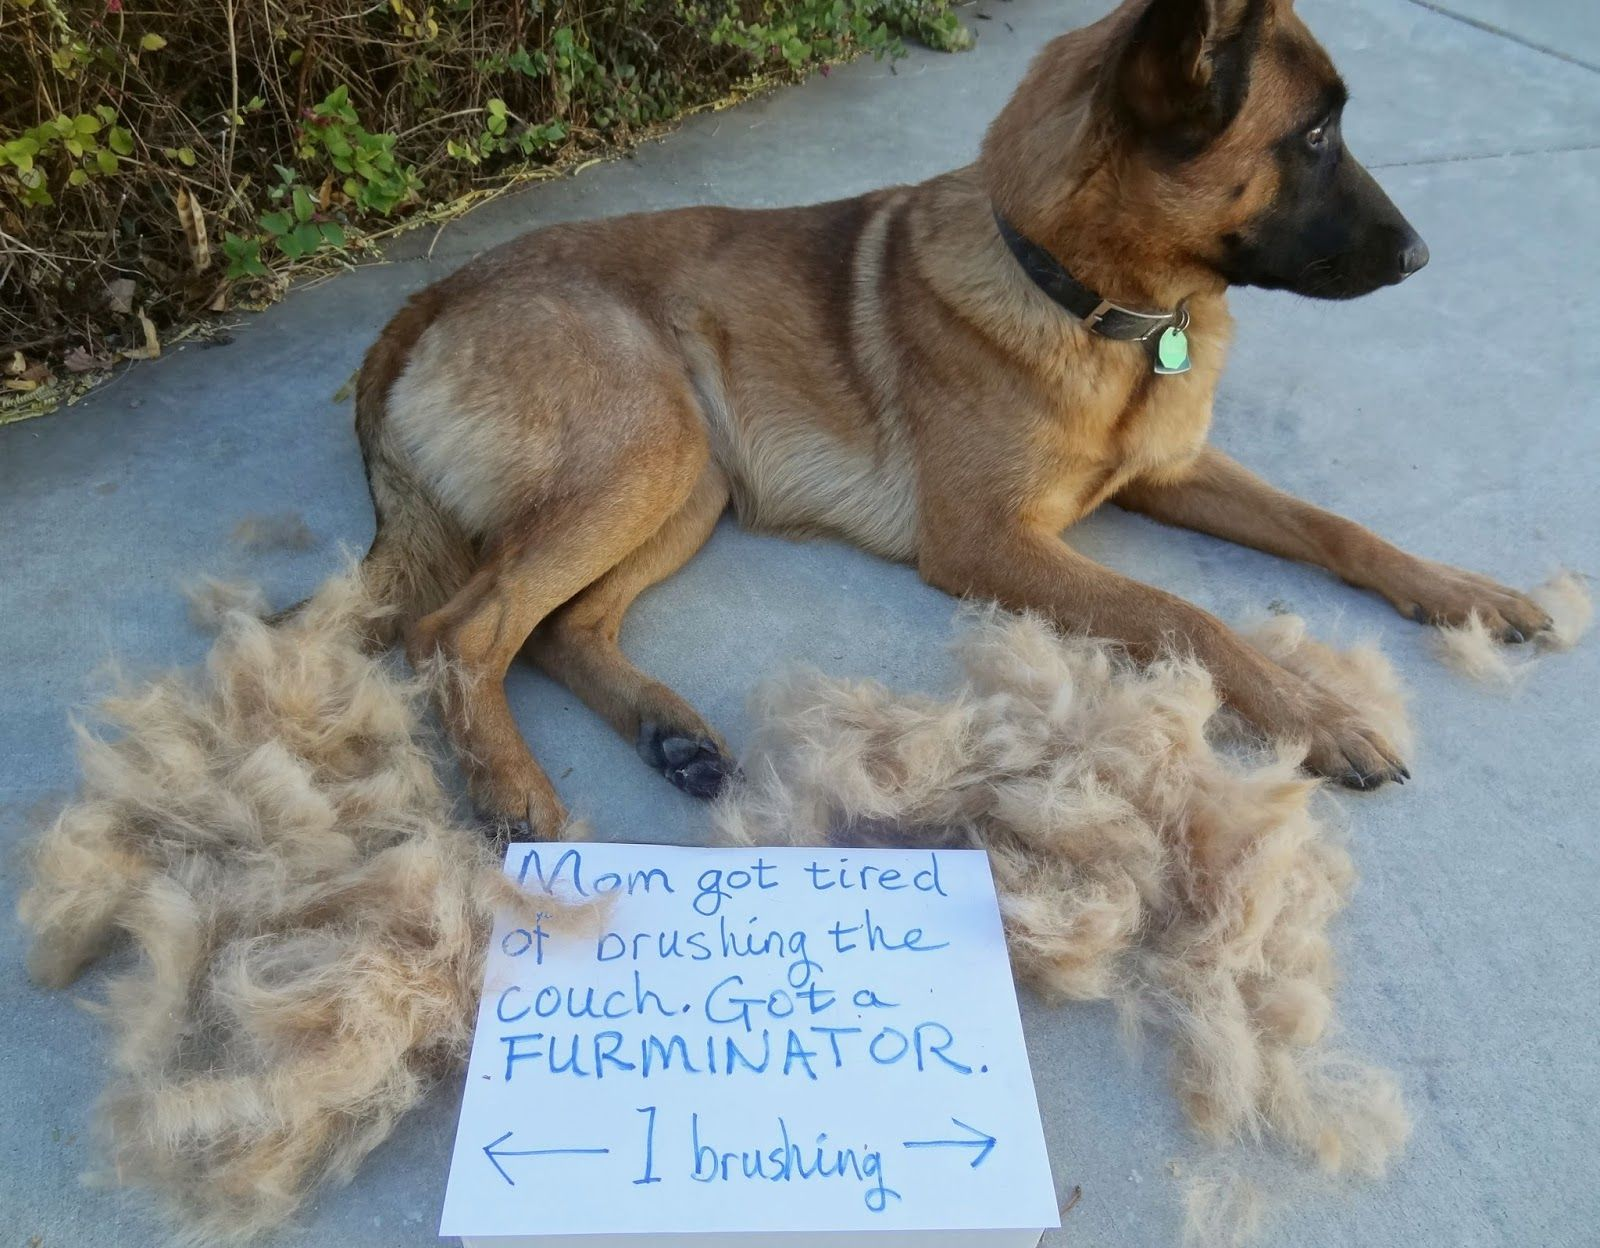 Furminator deshedding tools for dogs dogs deshedding